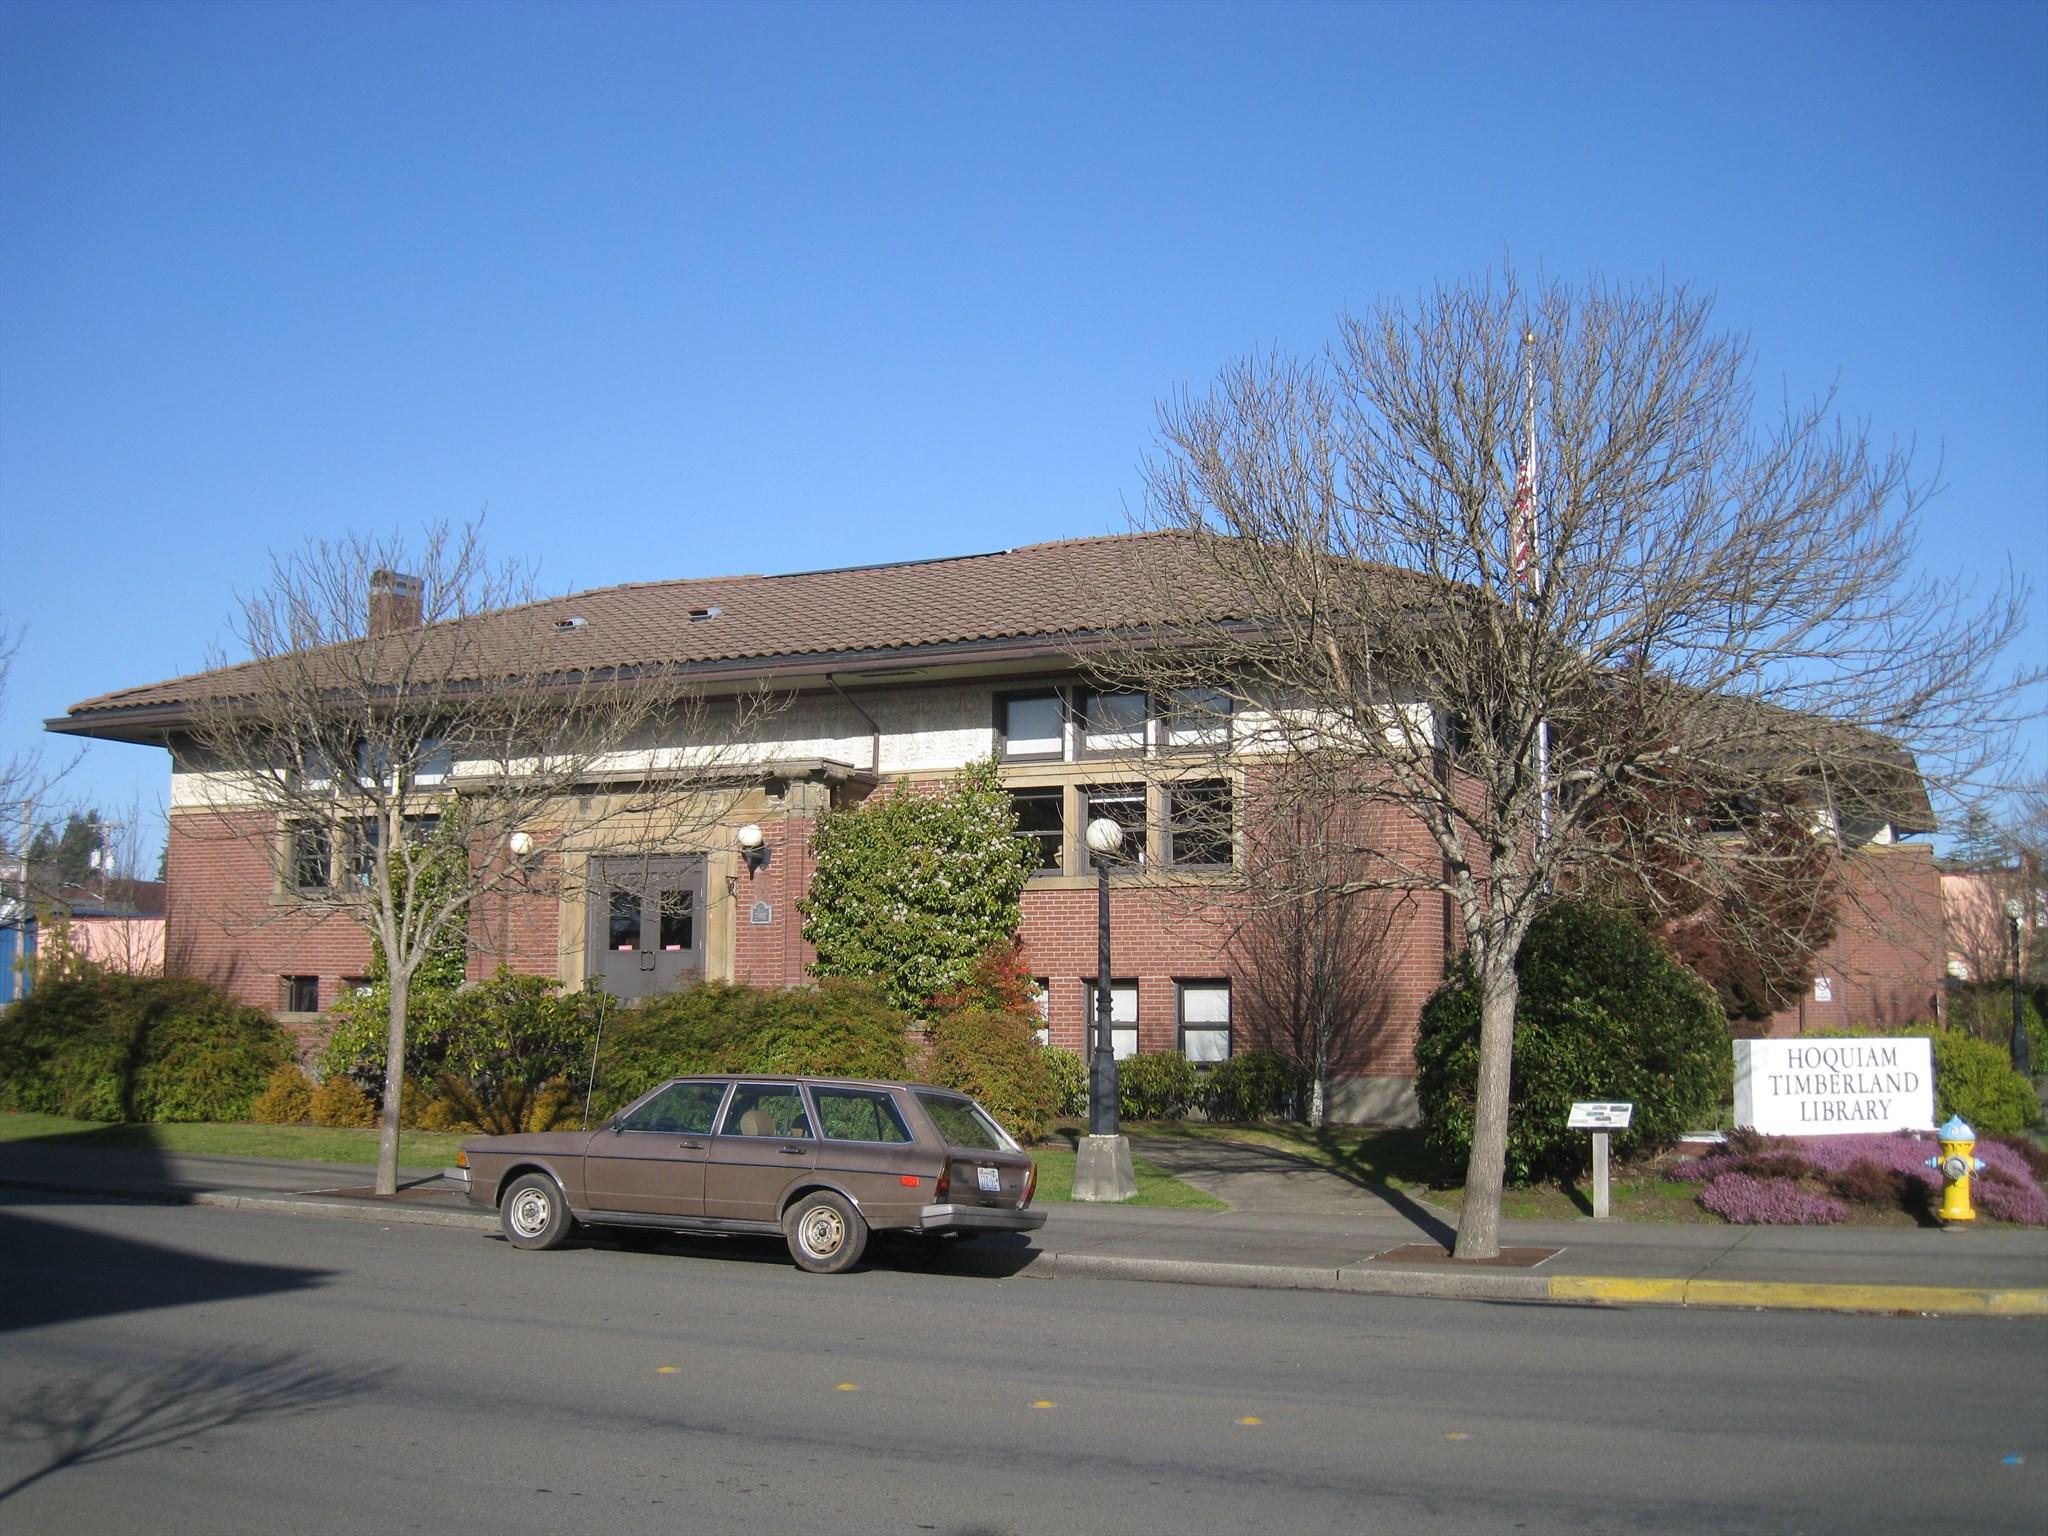 Hoquiam (WA) United States  city photos gallery : Carnegie Library Hoquiam, Washington U.S. National Register of ...